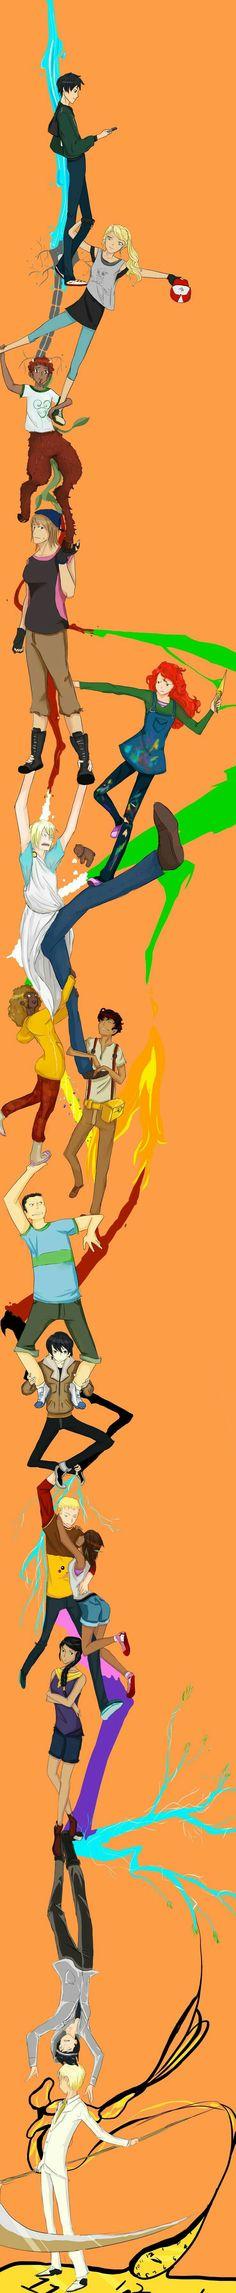 Percy,Annabeth,Grover, Clarisse,Rachel,Octavion, Hazel,Leo,Frank,Jason, Piper,Reyna,Thalia and Luke